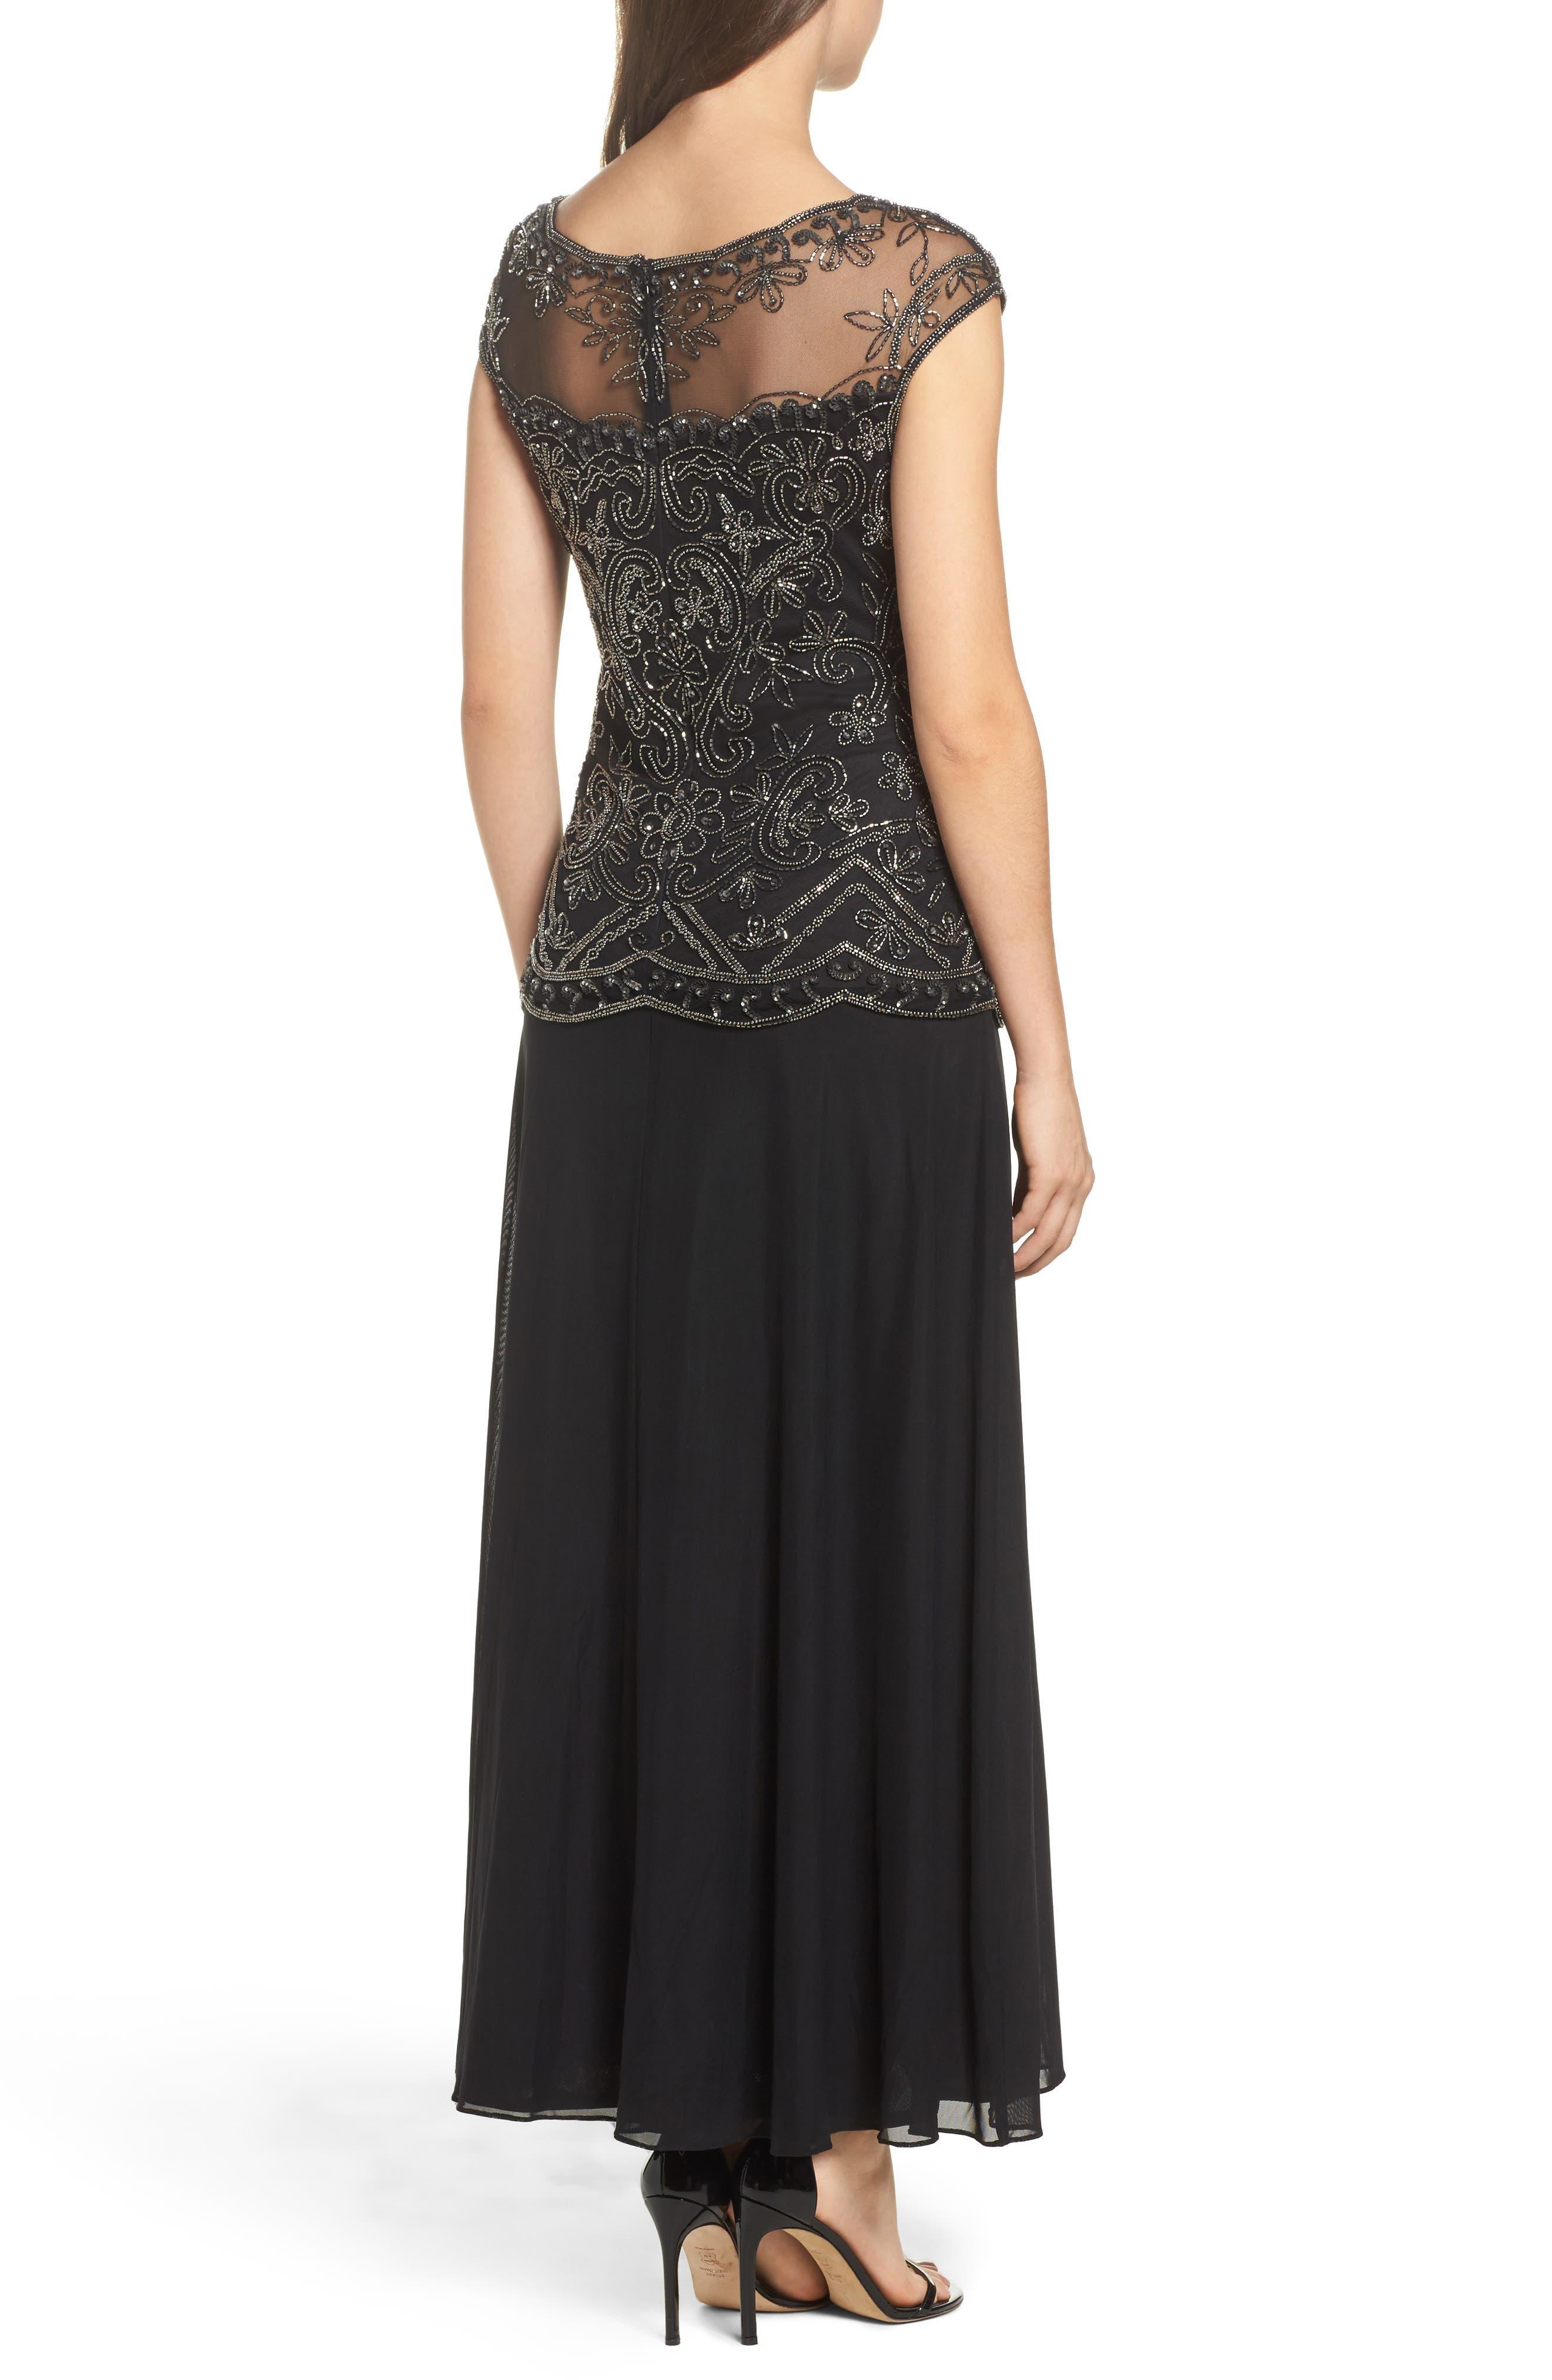 Embellished Cap Sleeve Long Dress,                             Alternate thumbnail 2, color,                             Black